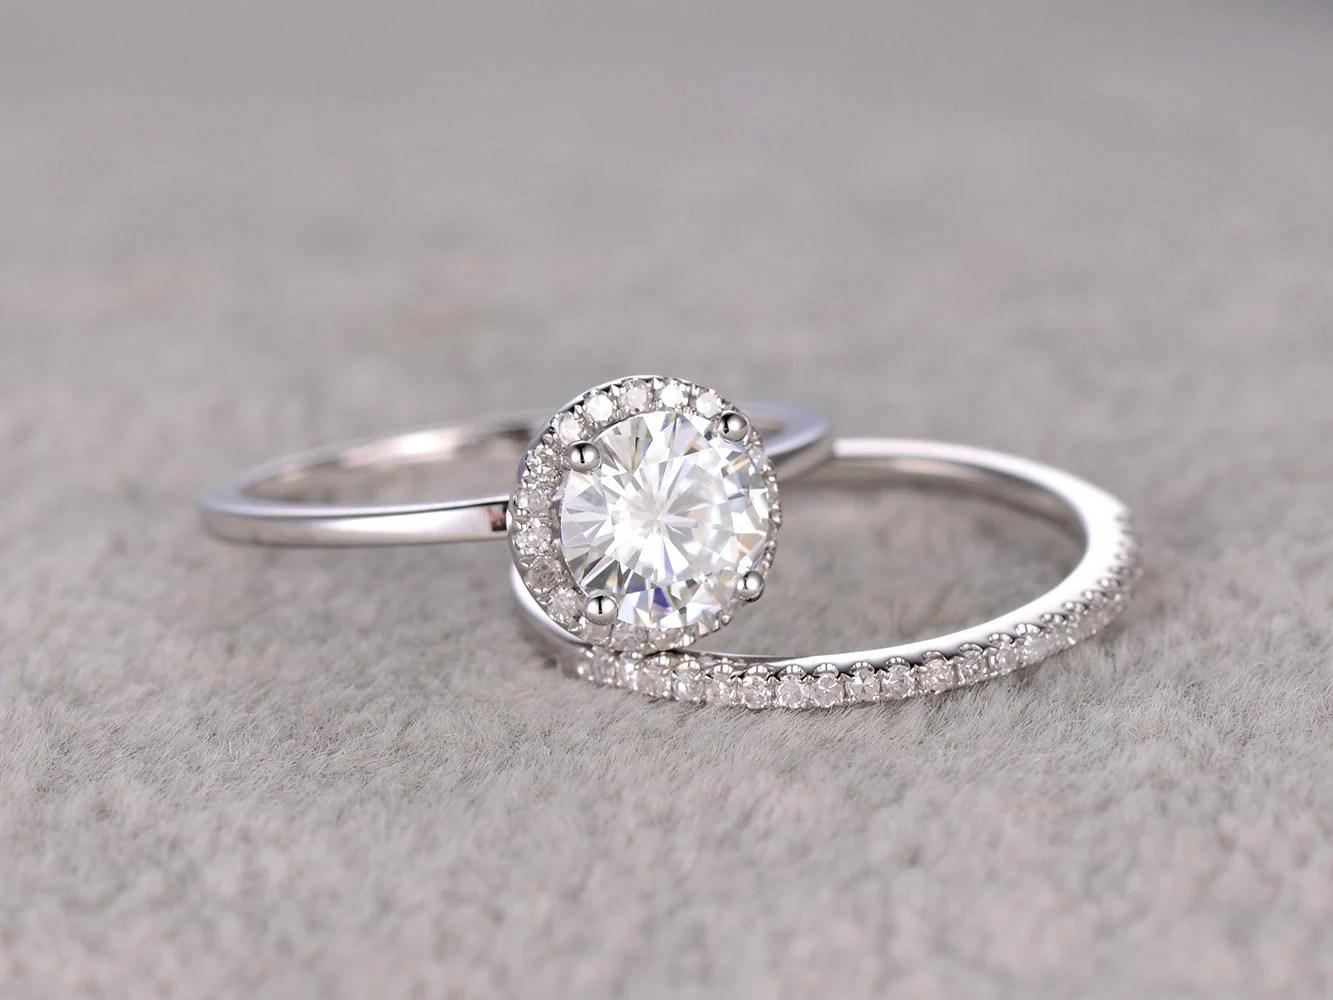 thin white gold ring wedding ring spacer 2pcs 1ct Moissanite Bridal Ring Set Engagement ring White Plain gold Ultra Thin Diamond wedding band 6 5mm Round stone Promise Ring Stacking